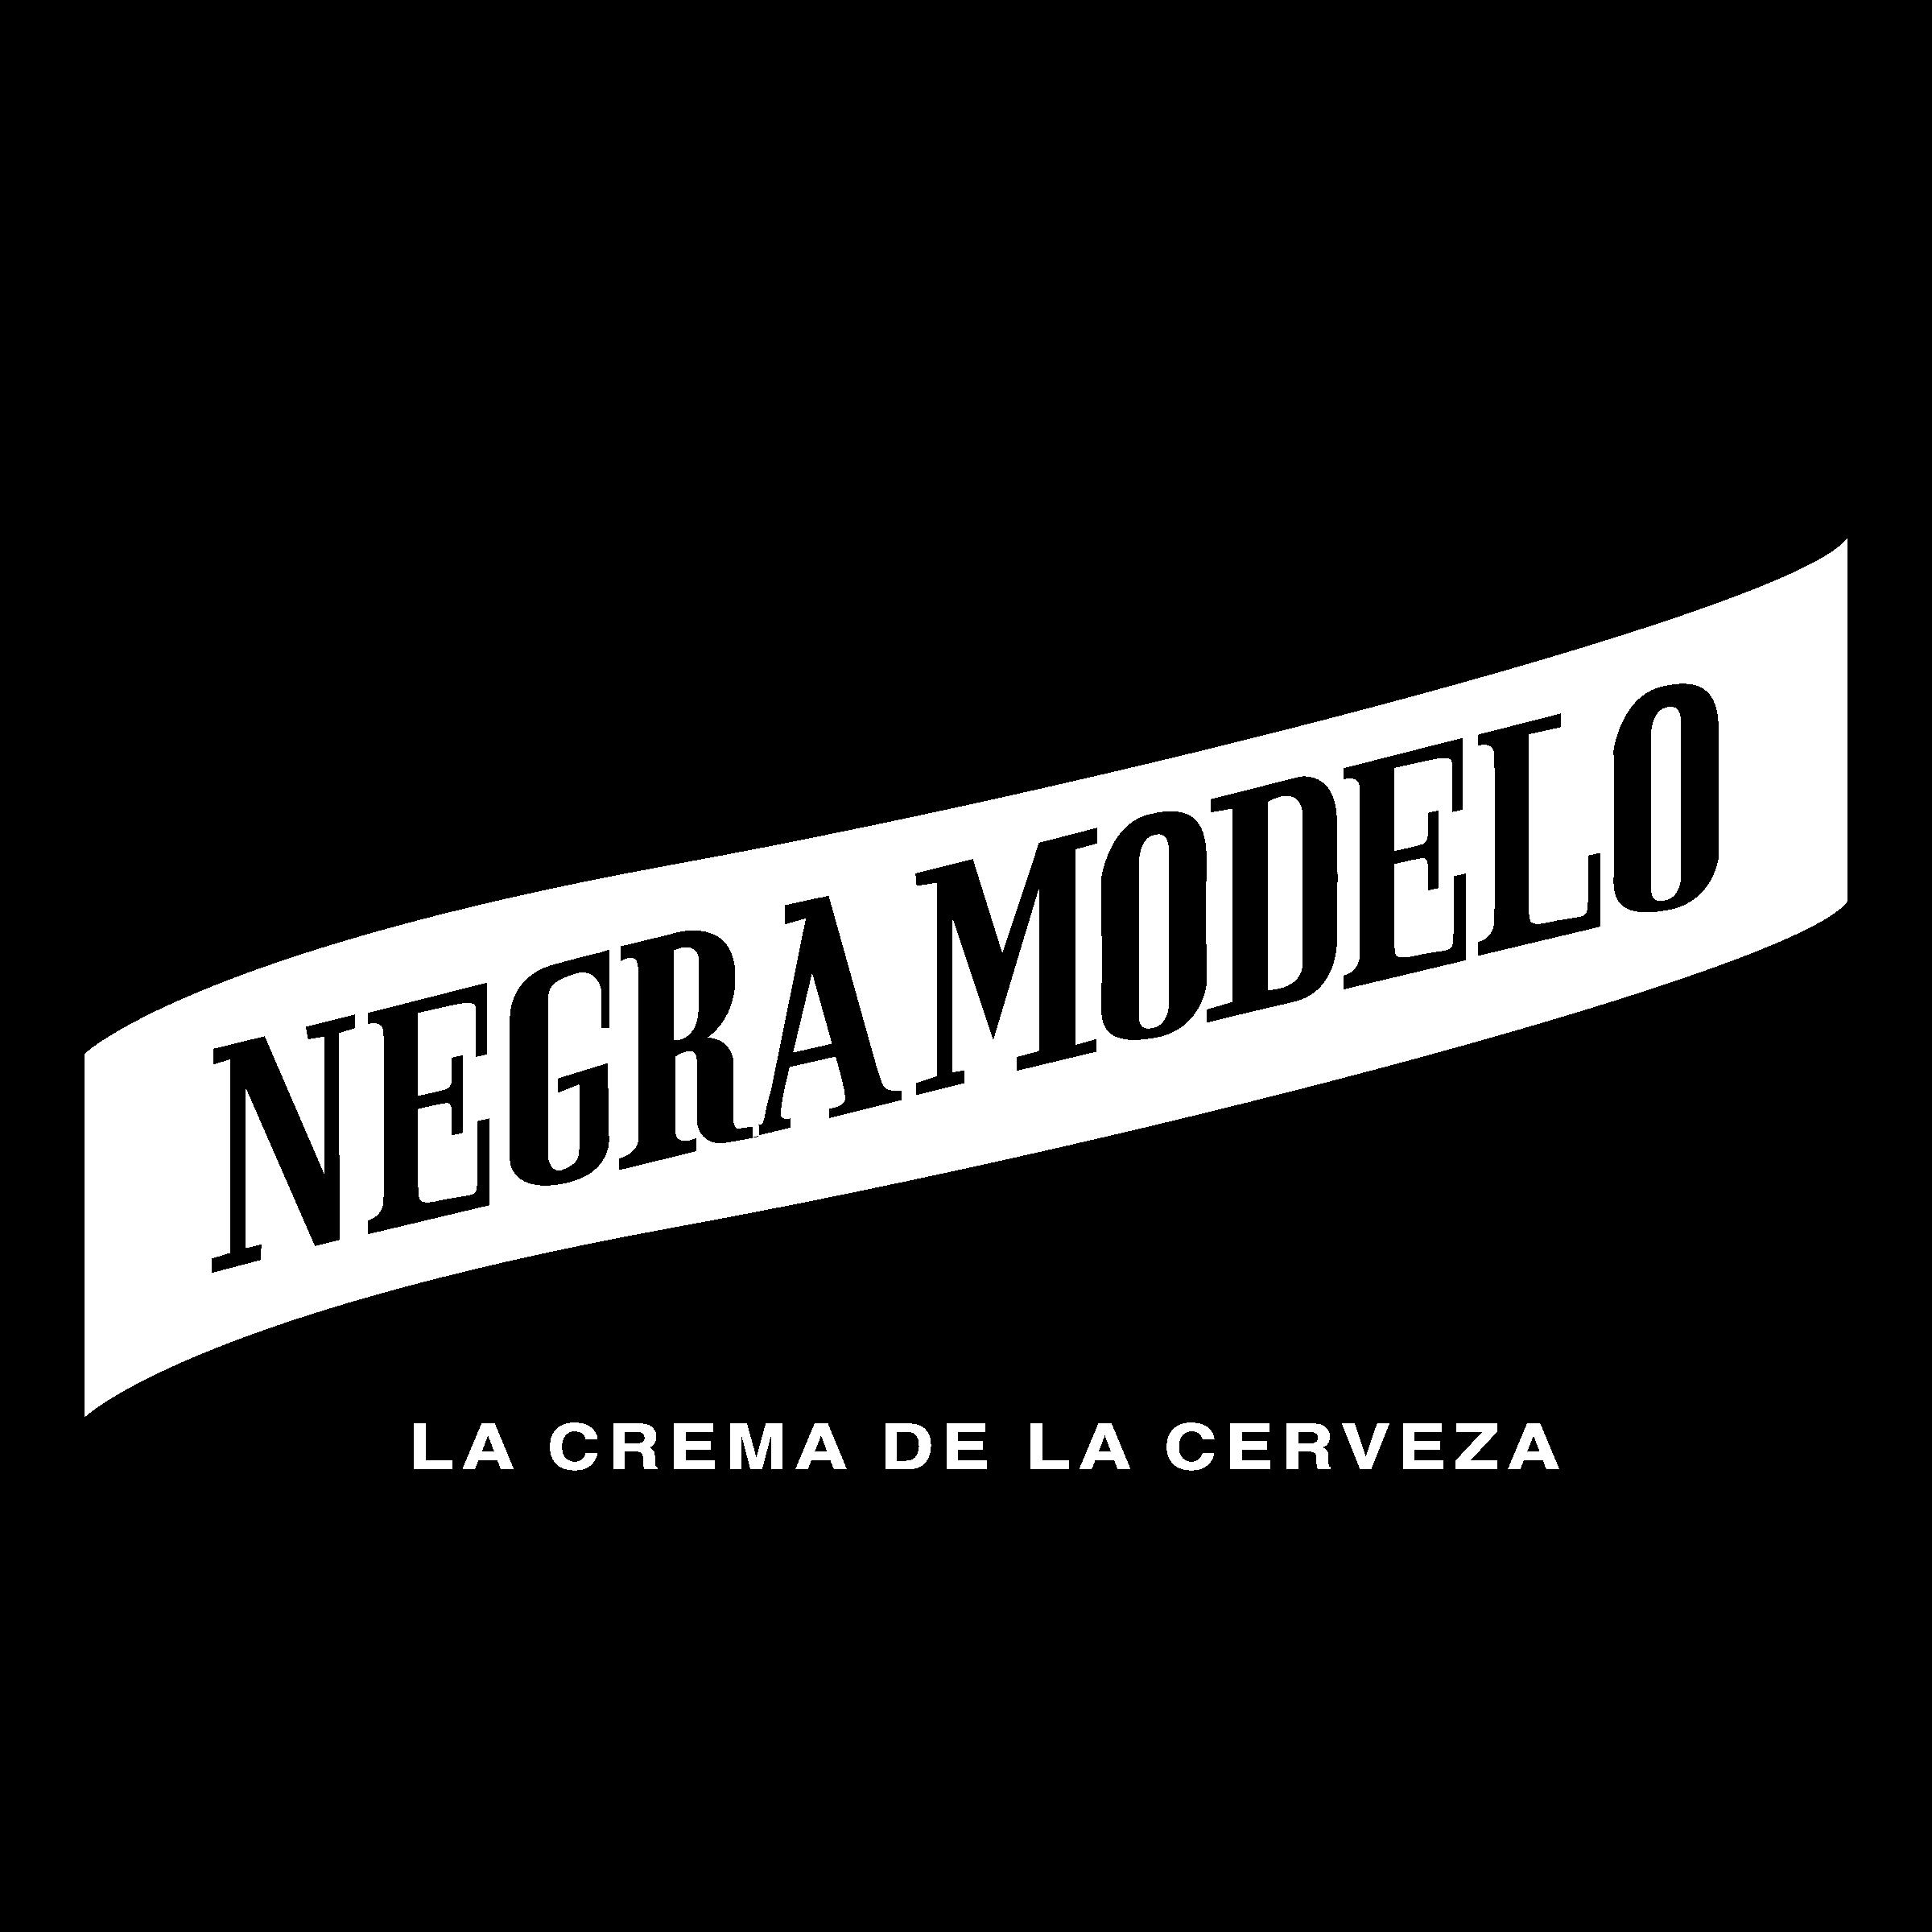 negra modelo logo png 85099 enews